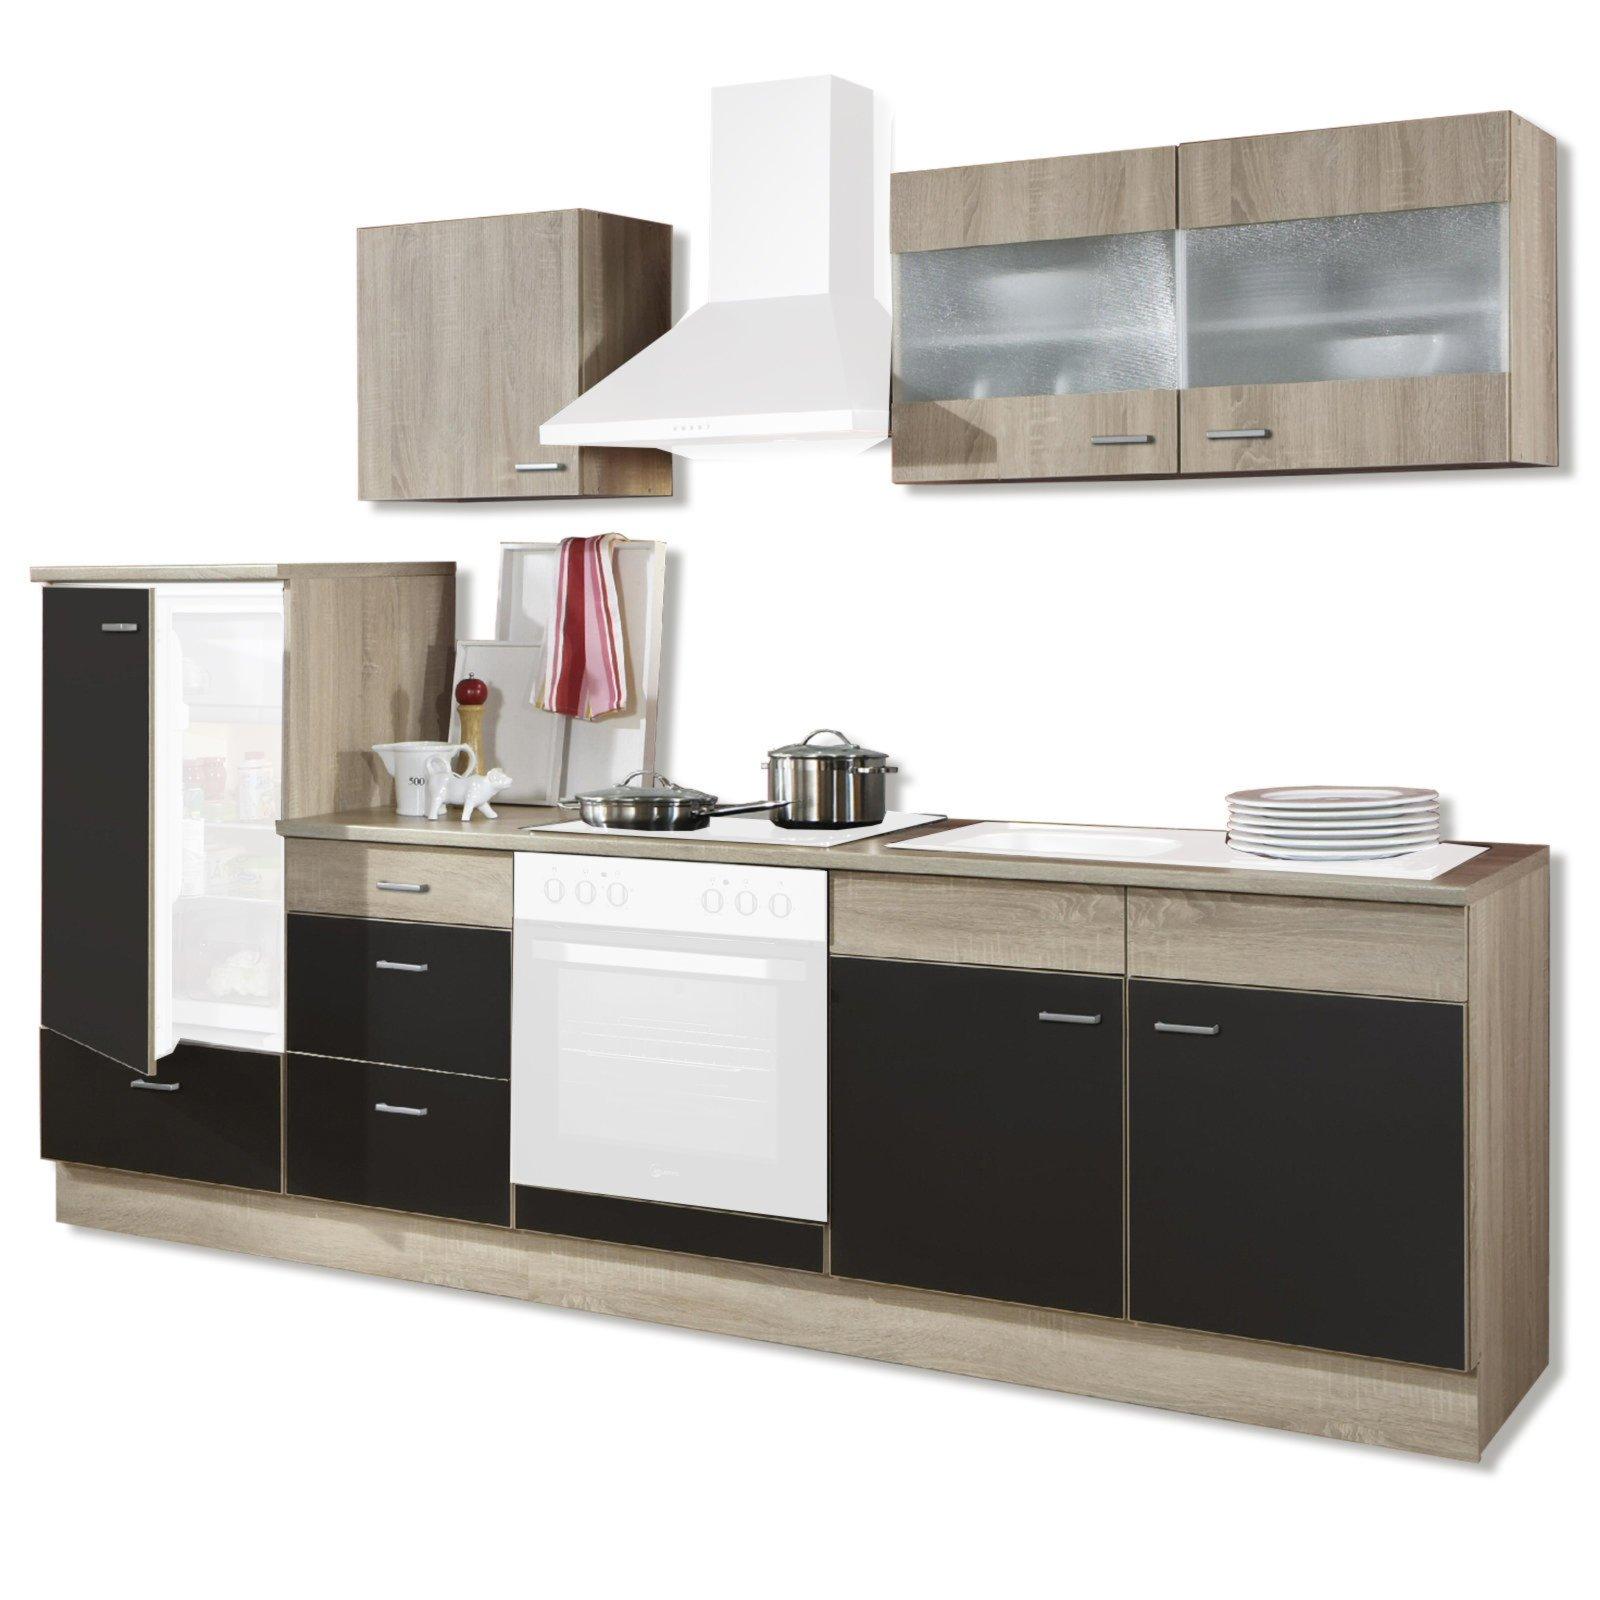 k chenblock jolina lava matt sonoma eiche 270 cm ebay. Black Bedroom Furniture Sets. Home Design Ideas